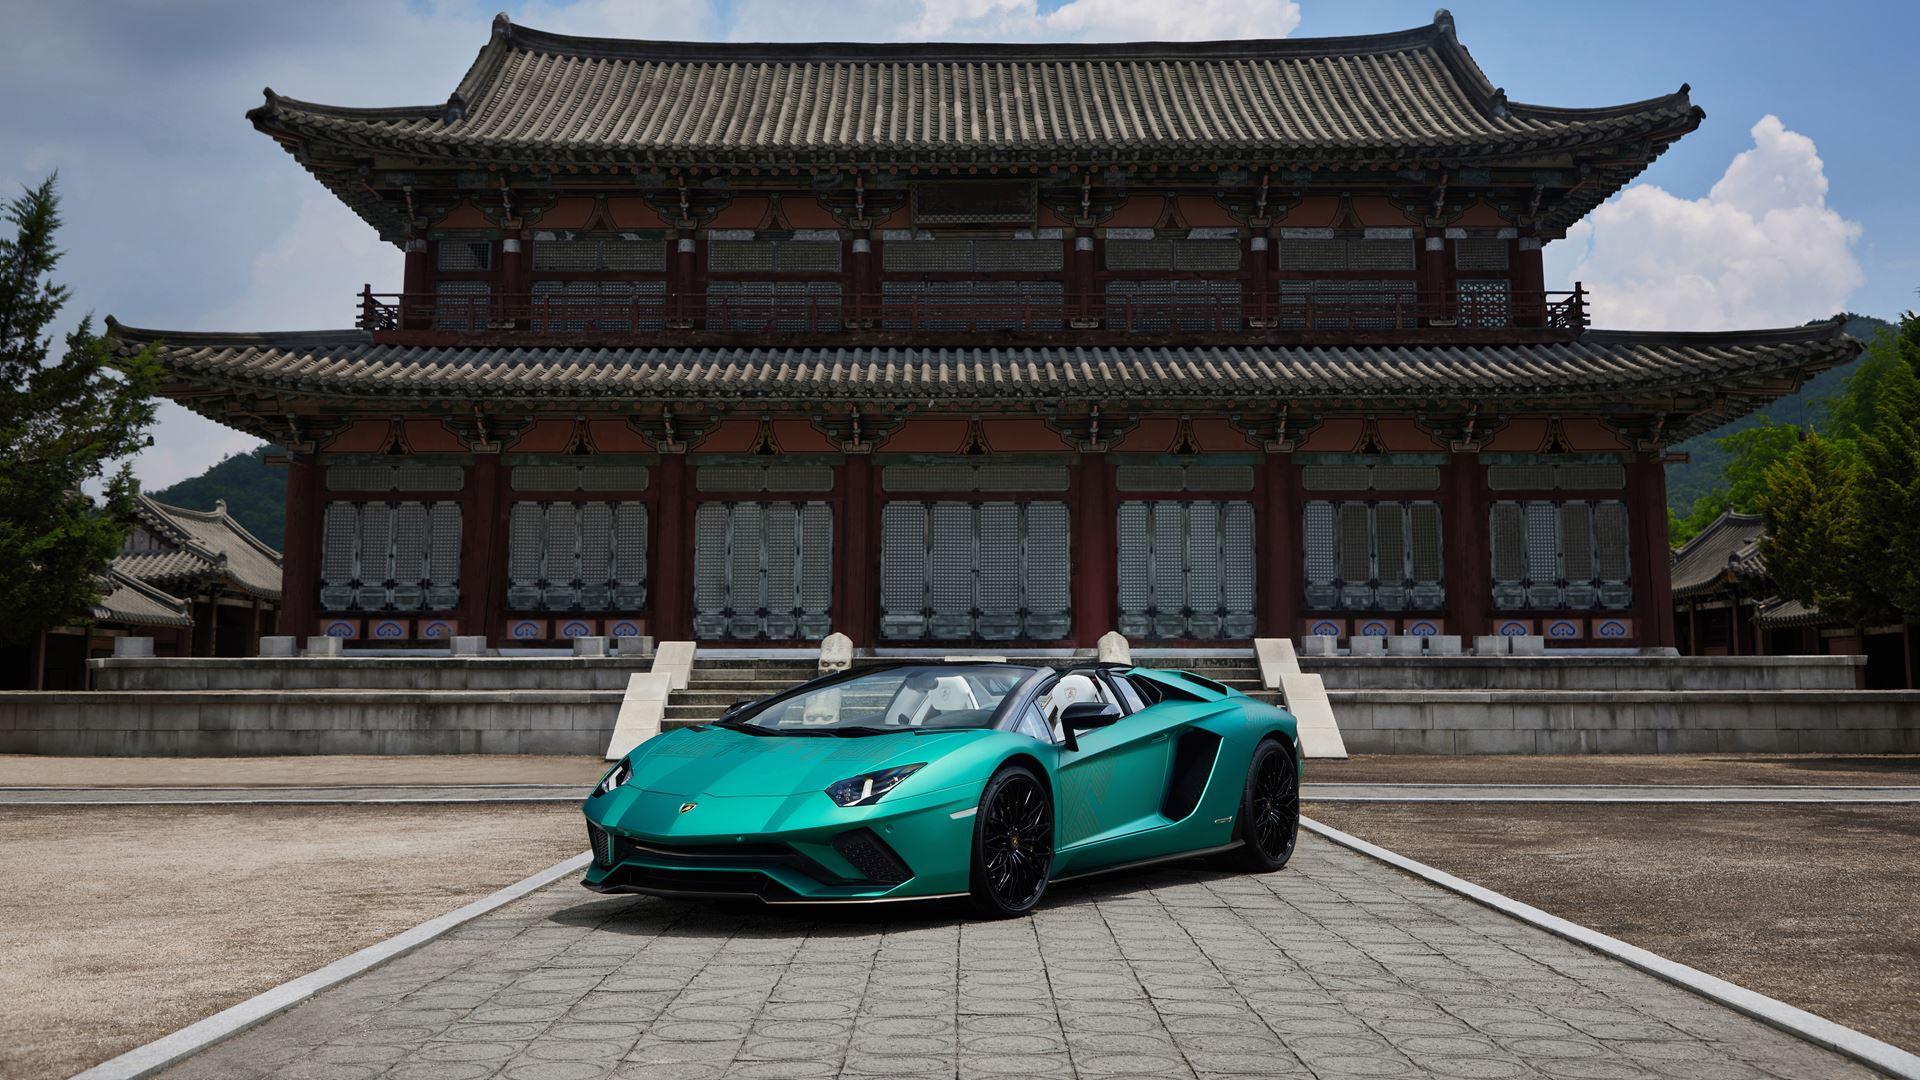 Lamborghini Seoul Unveils the Aventador S Roadster Korean Special Series - Image 8